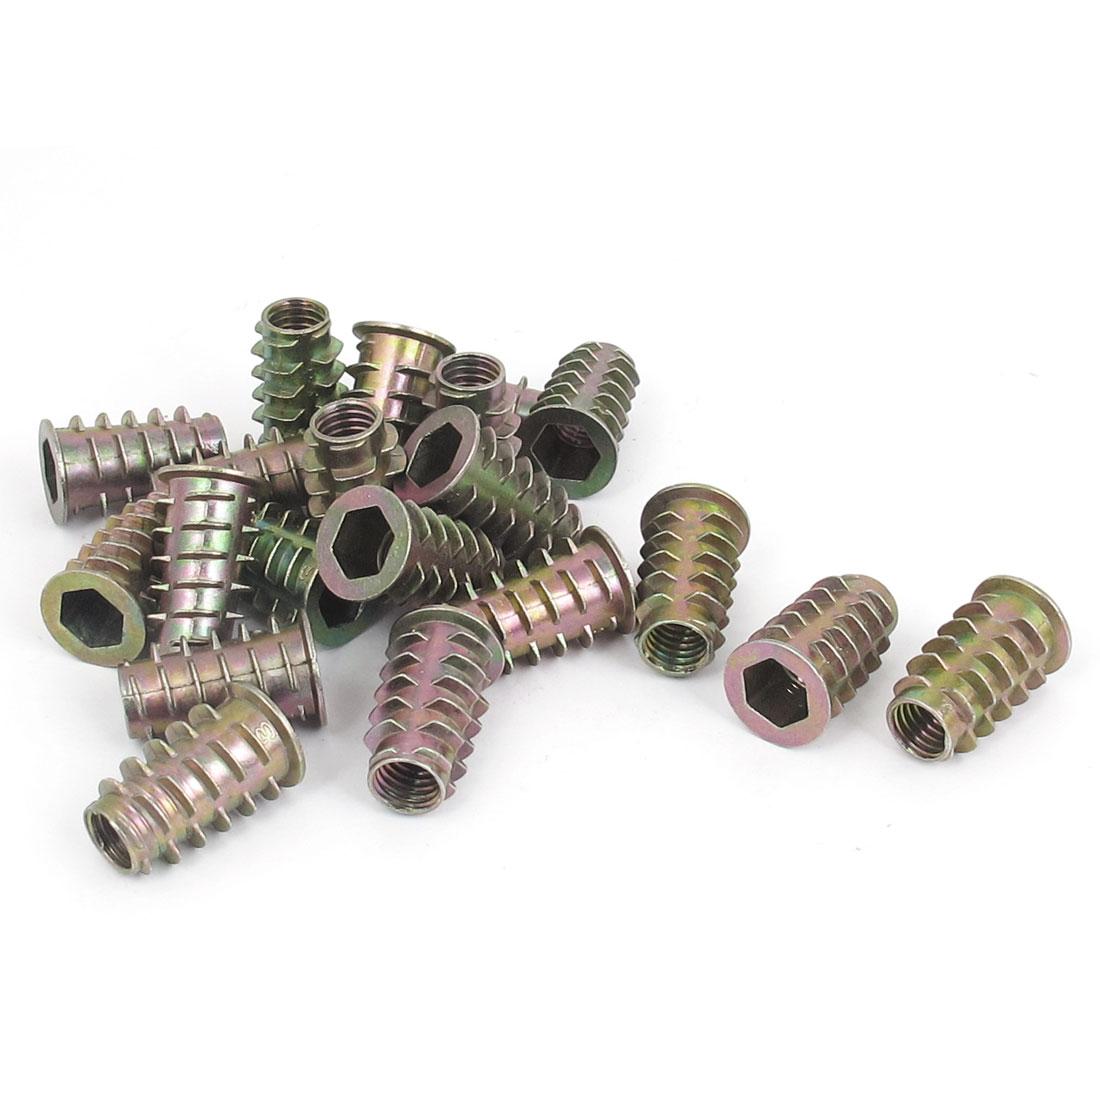 20 Pcs M8x23mm Zinc Plated Hex Socket Screw in Thread Insert Nut for Wood